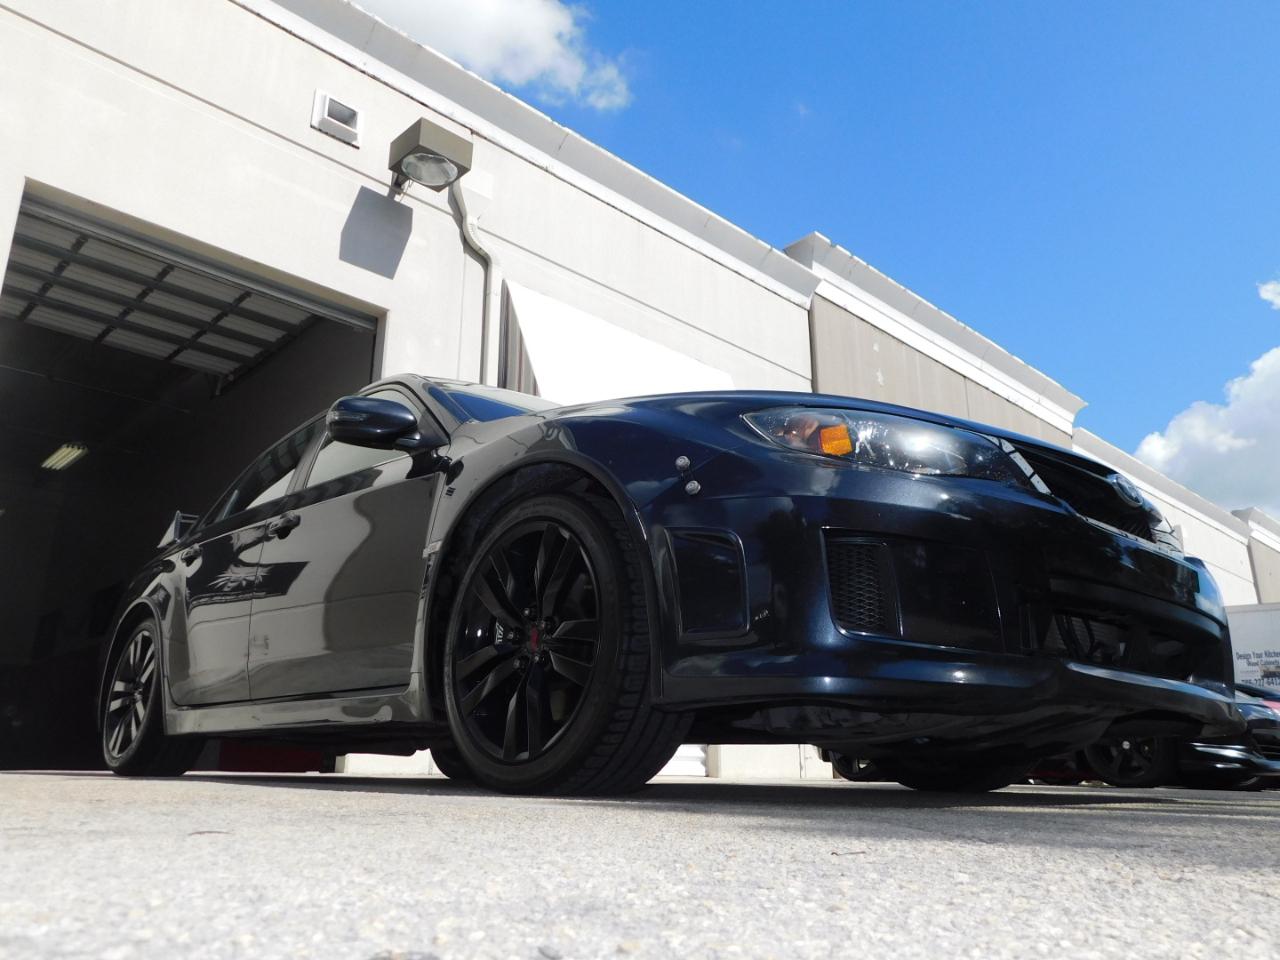 2014 Subaru Impreza WRX STI 4-Door